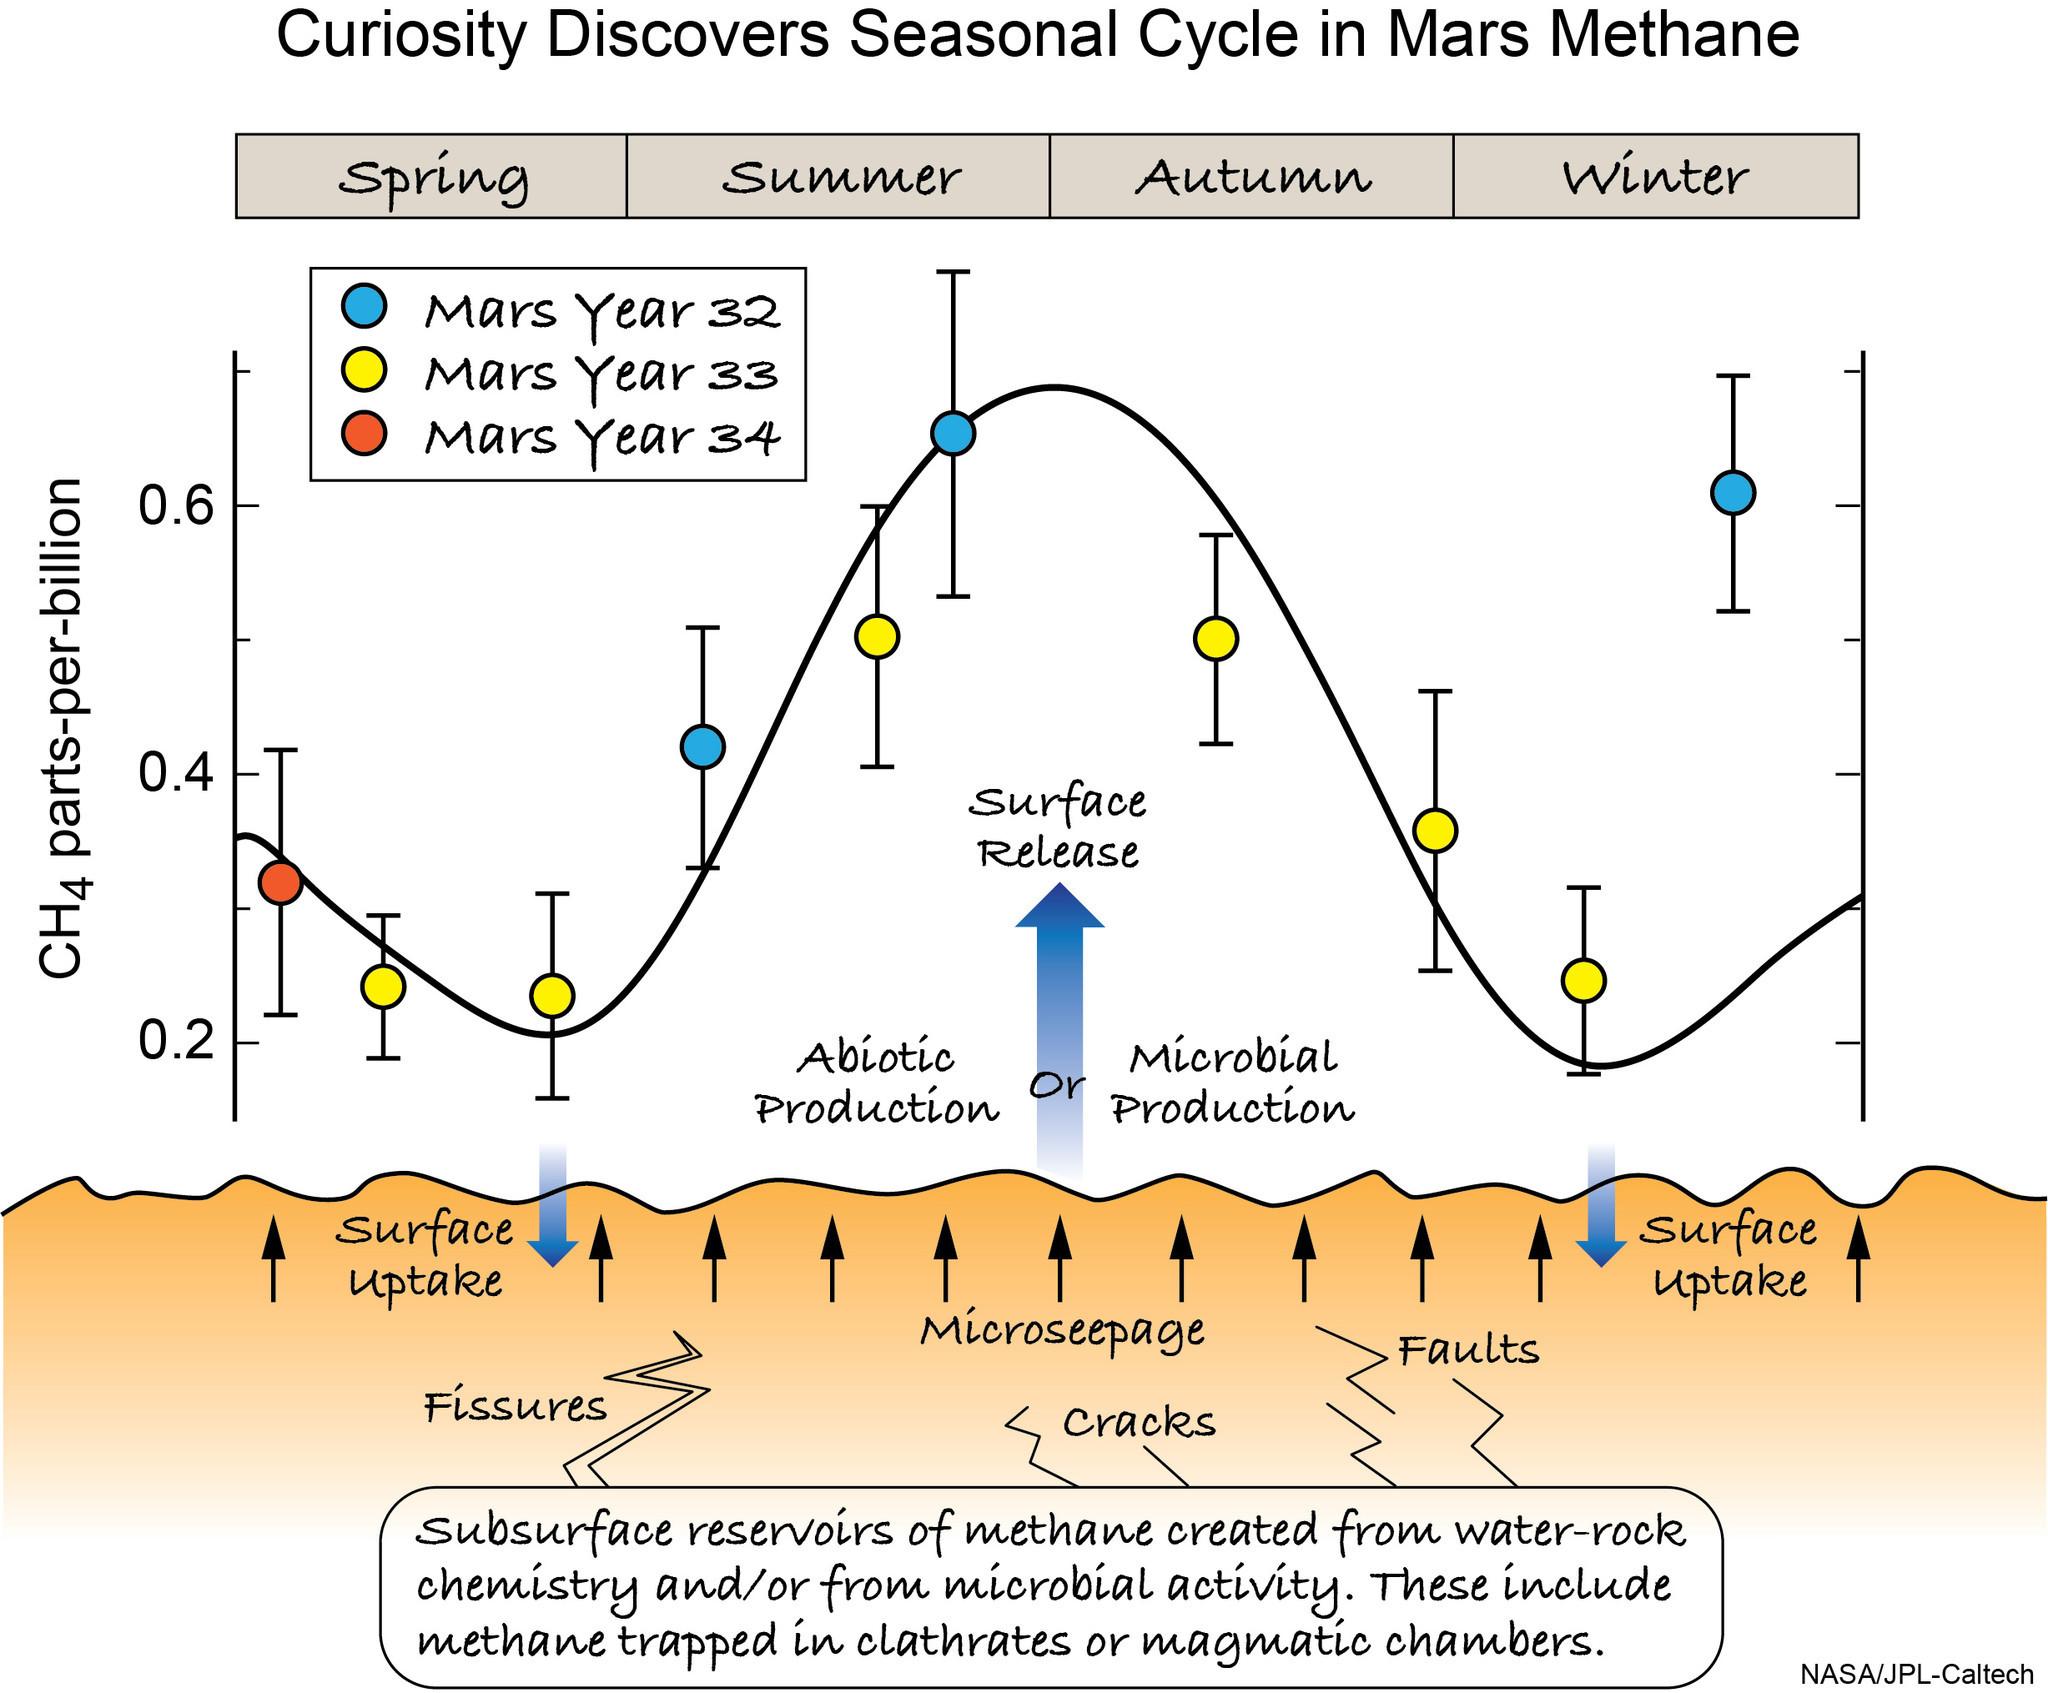 curiosity rover diagram smart car 451 wiring 39s findings on mars 39 organic molecules